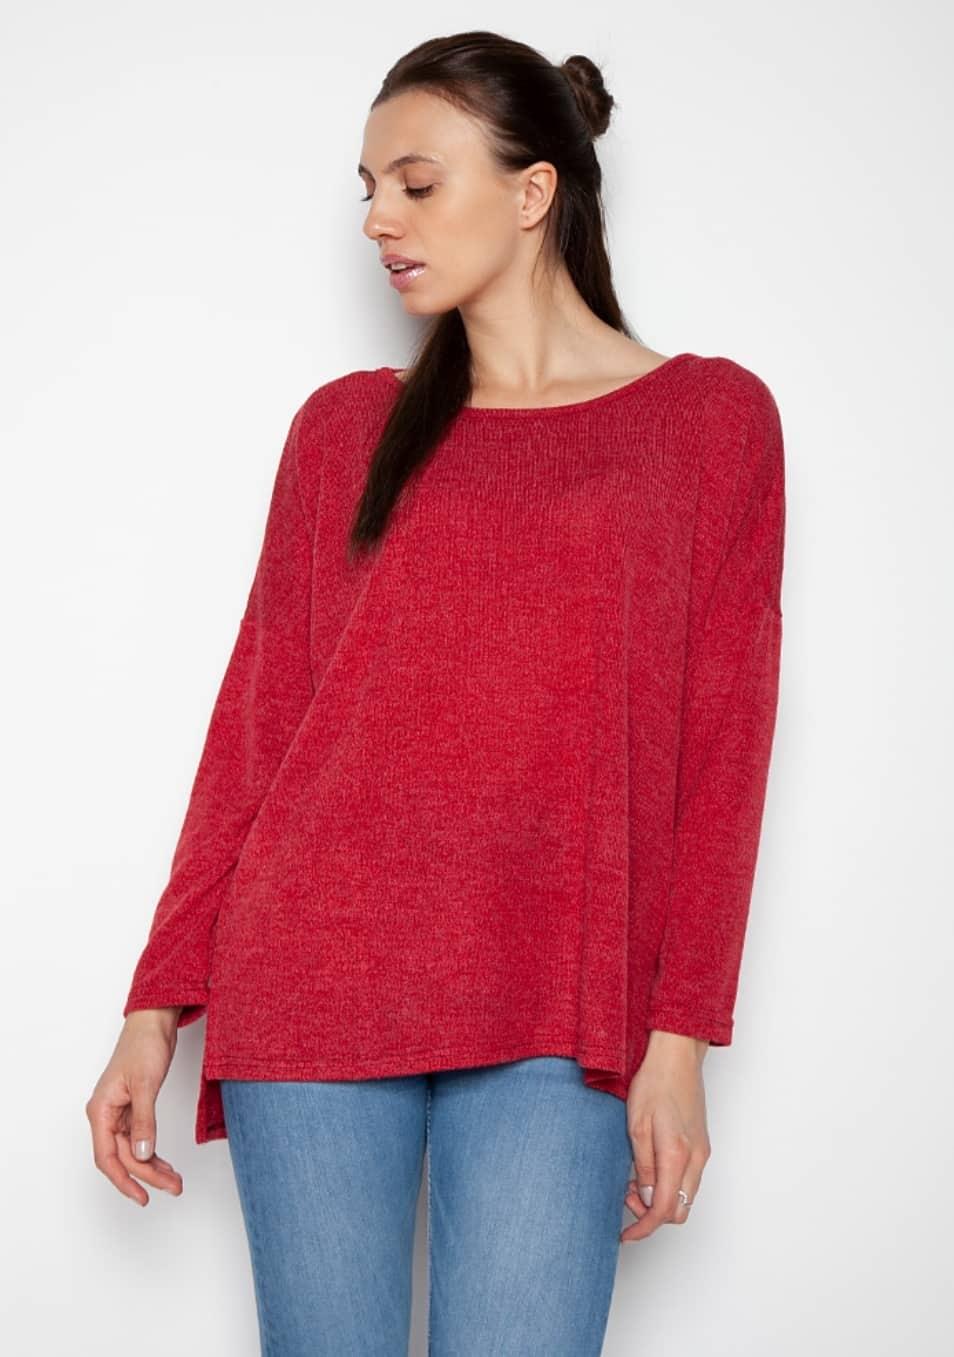 f9505c607662 Γυναικεία μπλούζα ασύμμετρη μακρυμάνικη κόκκινη σε άνετη γραμμή